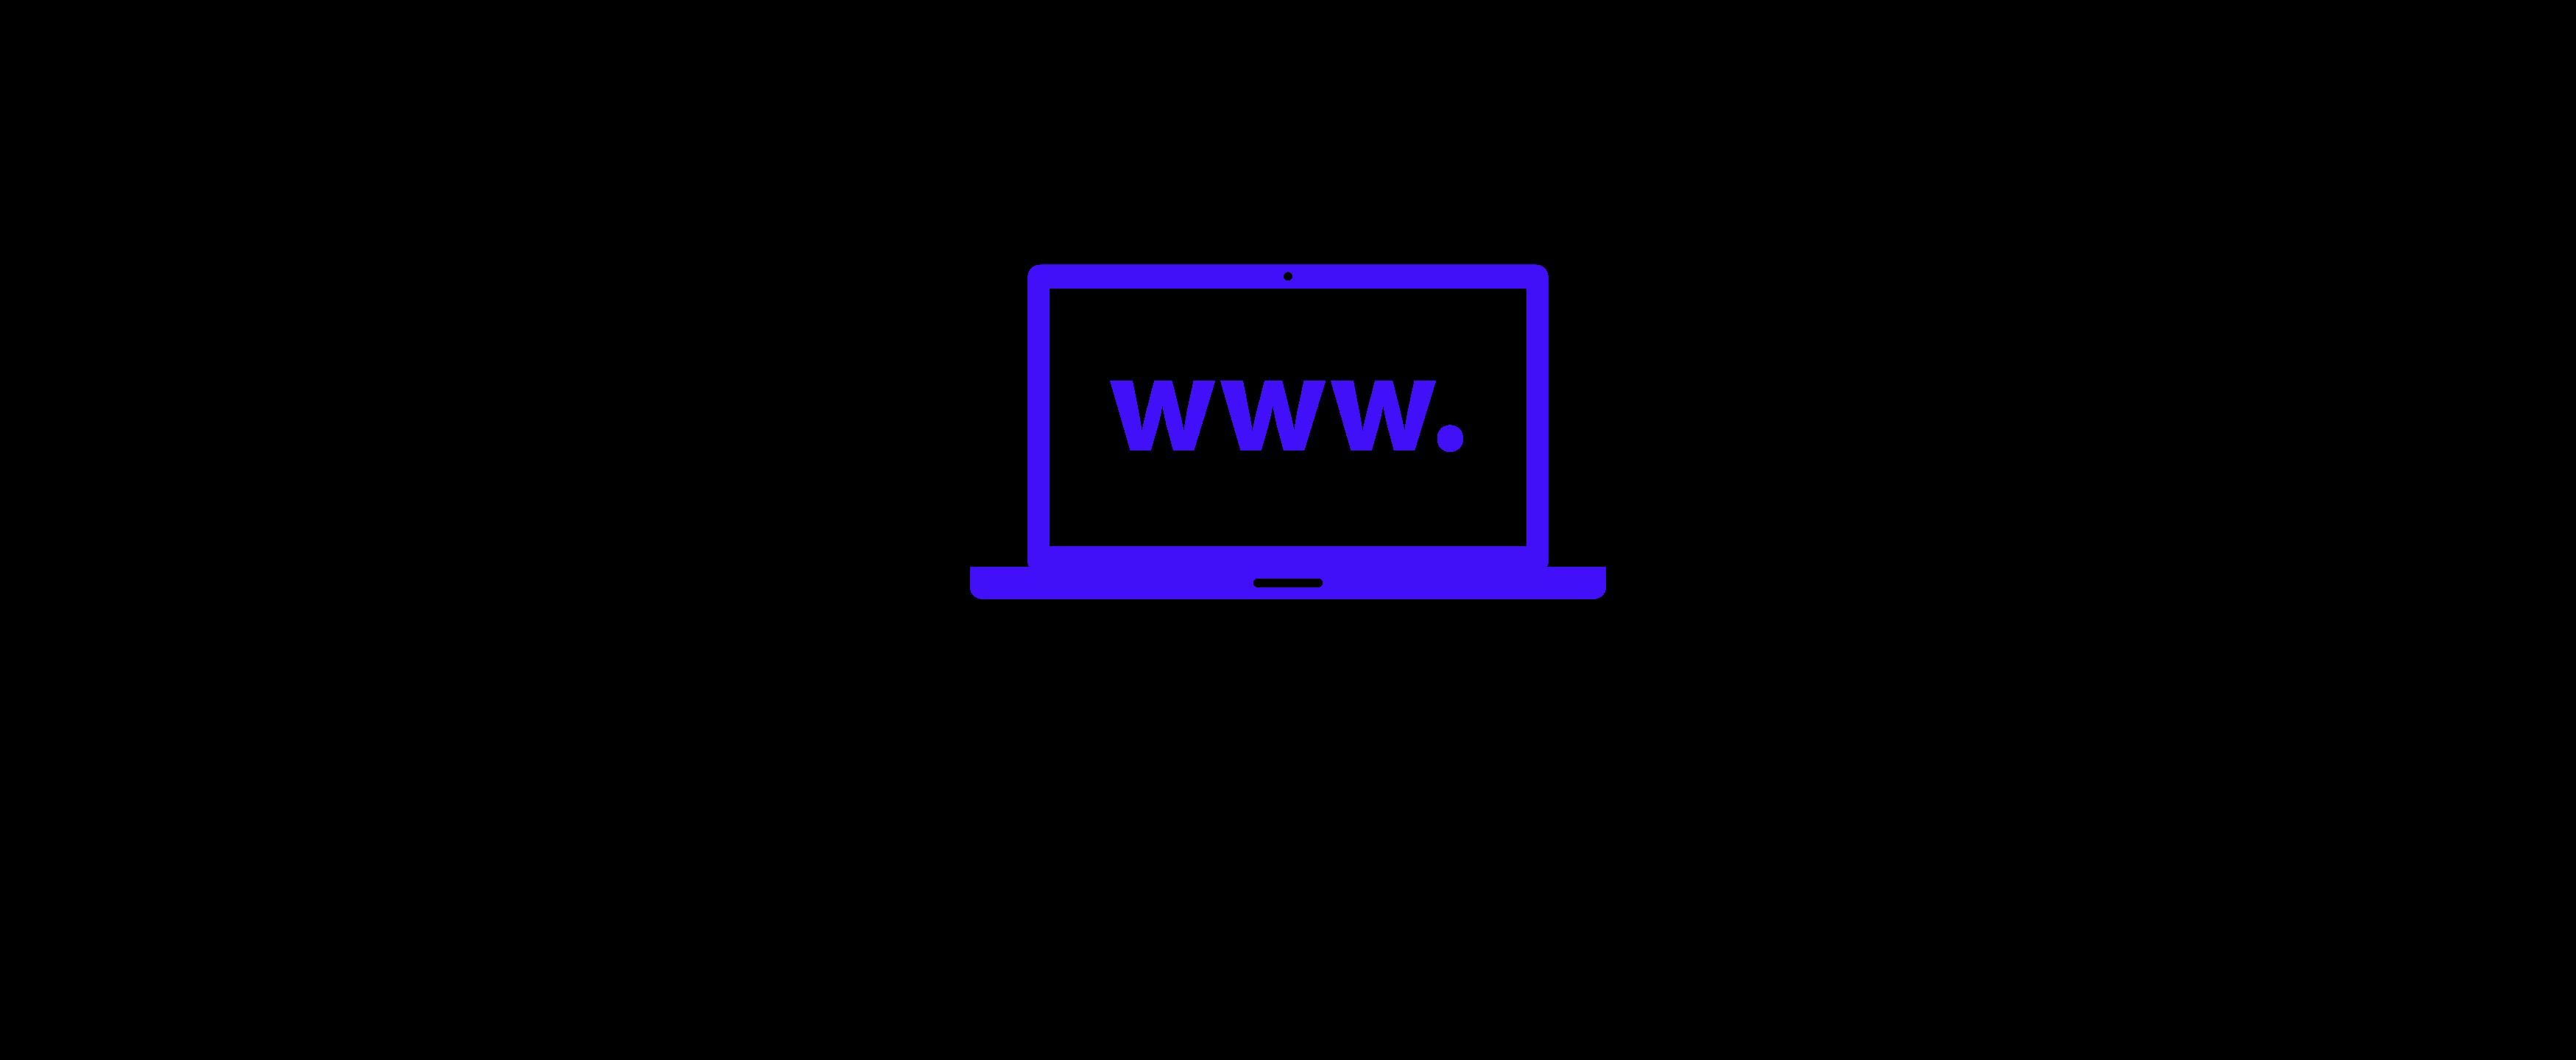 WWW.LARIONEN.COM - VERKKOKAUPPA